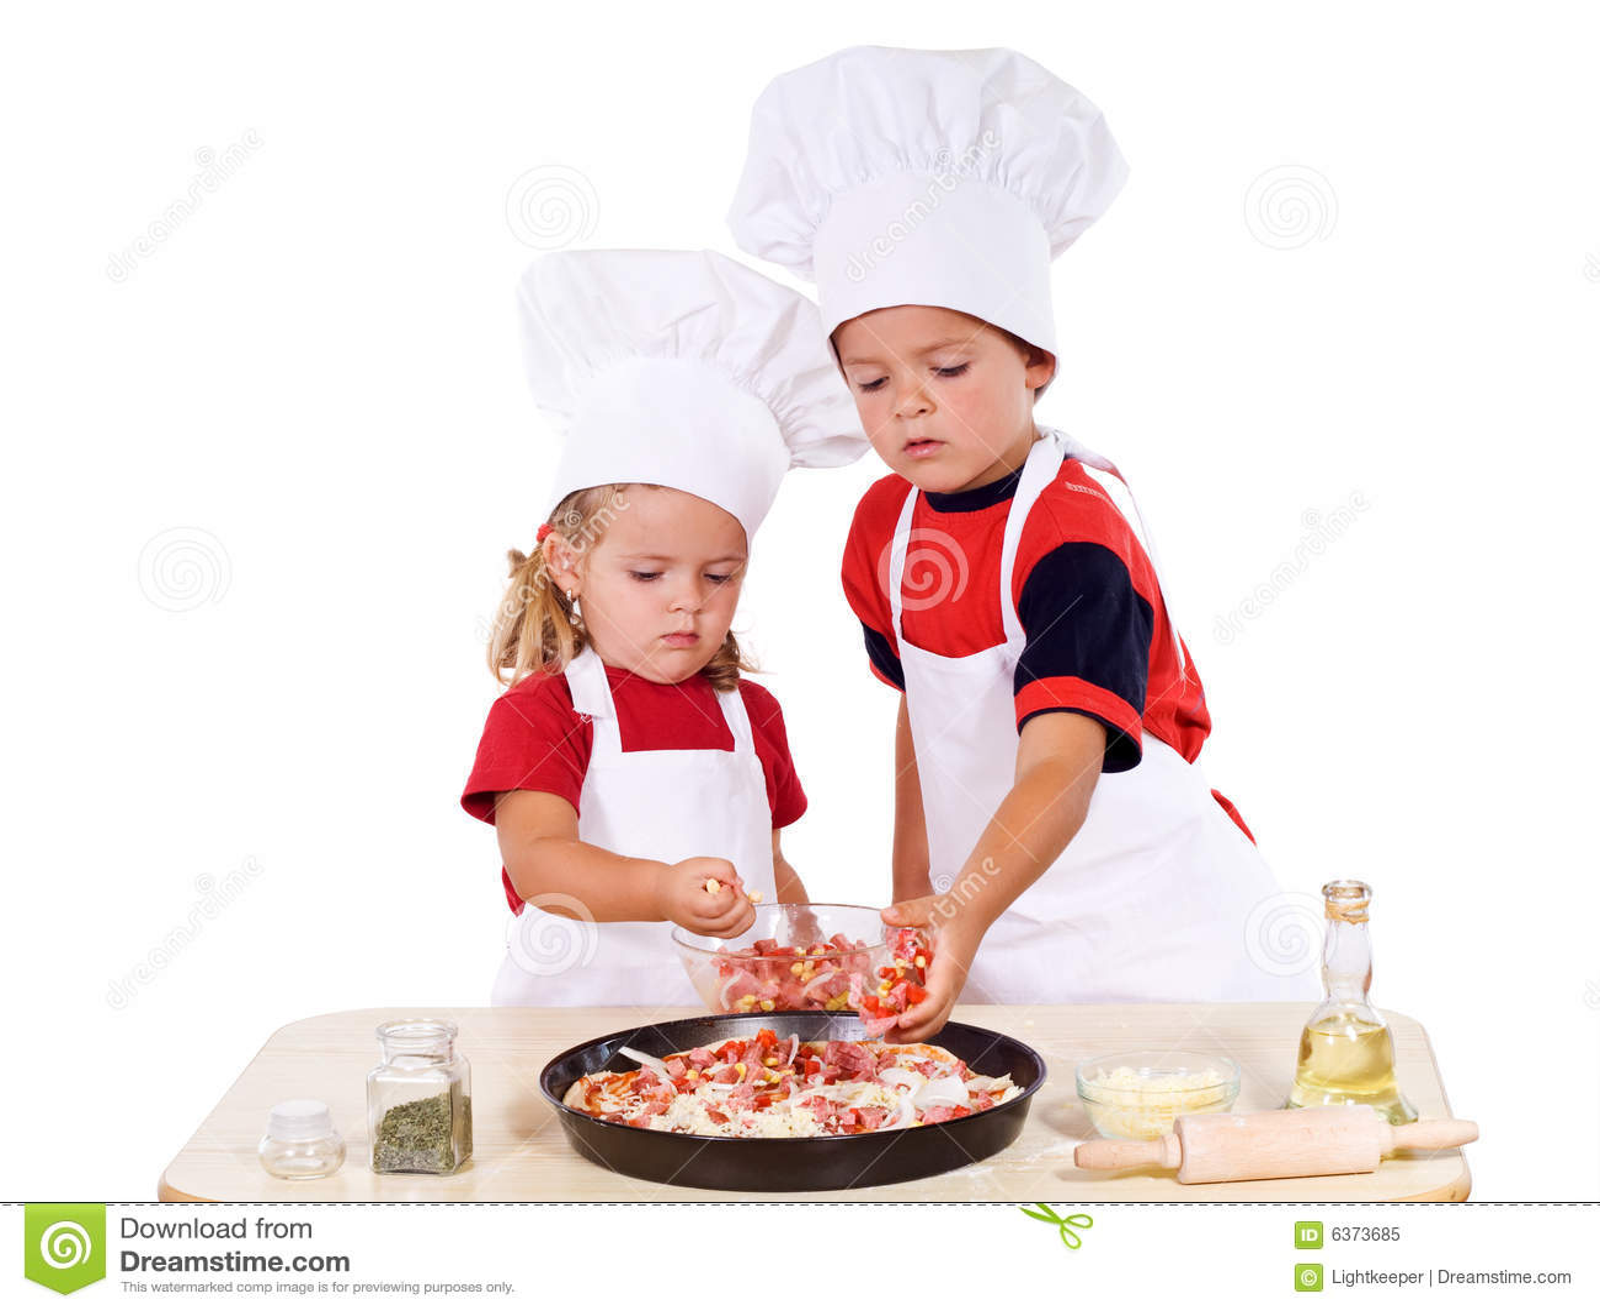 Kids preparing pizza